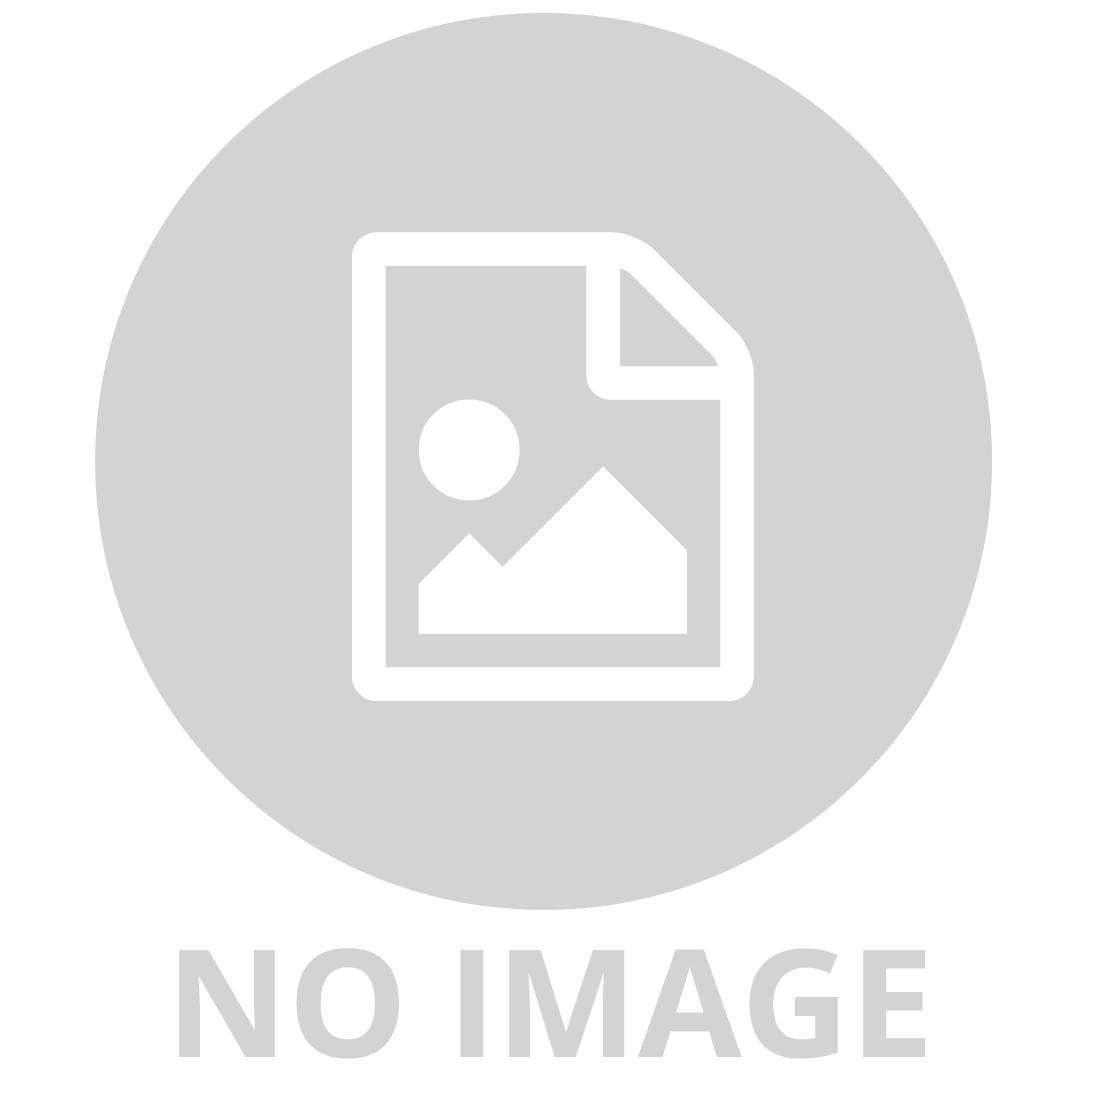 TAMIYA ACRYLIC X-8 LEMON YELLOW GLOSS